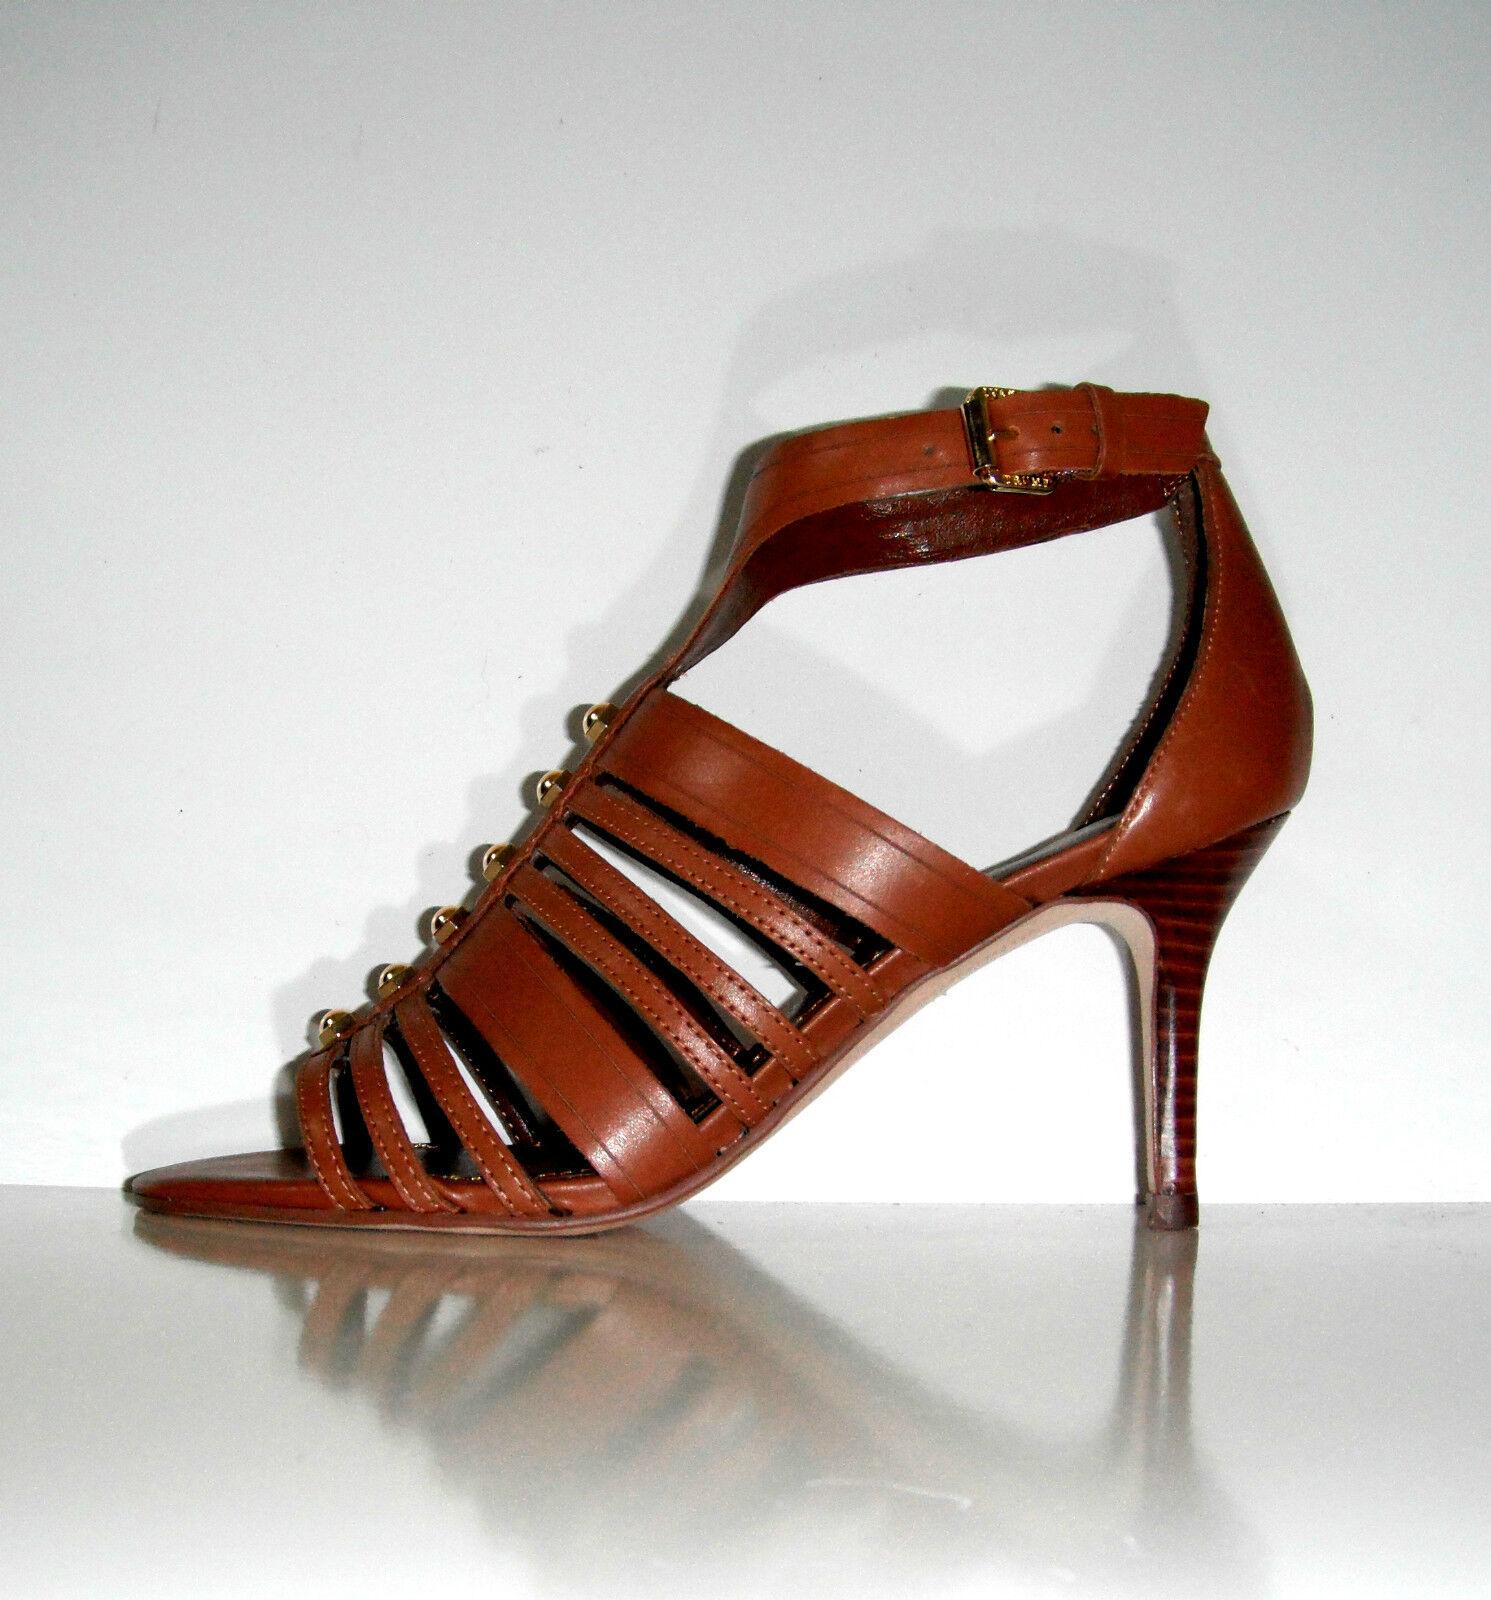 195 NEU Ivanka Trump Pettea Braun Leder Elegant Strappy Schuhes sz 10